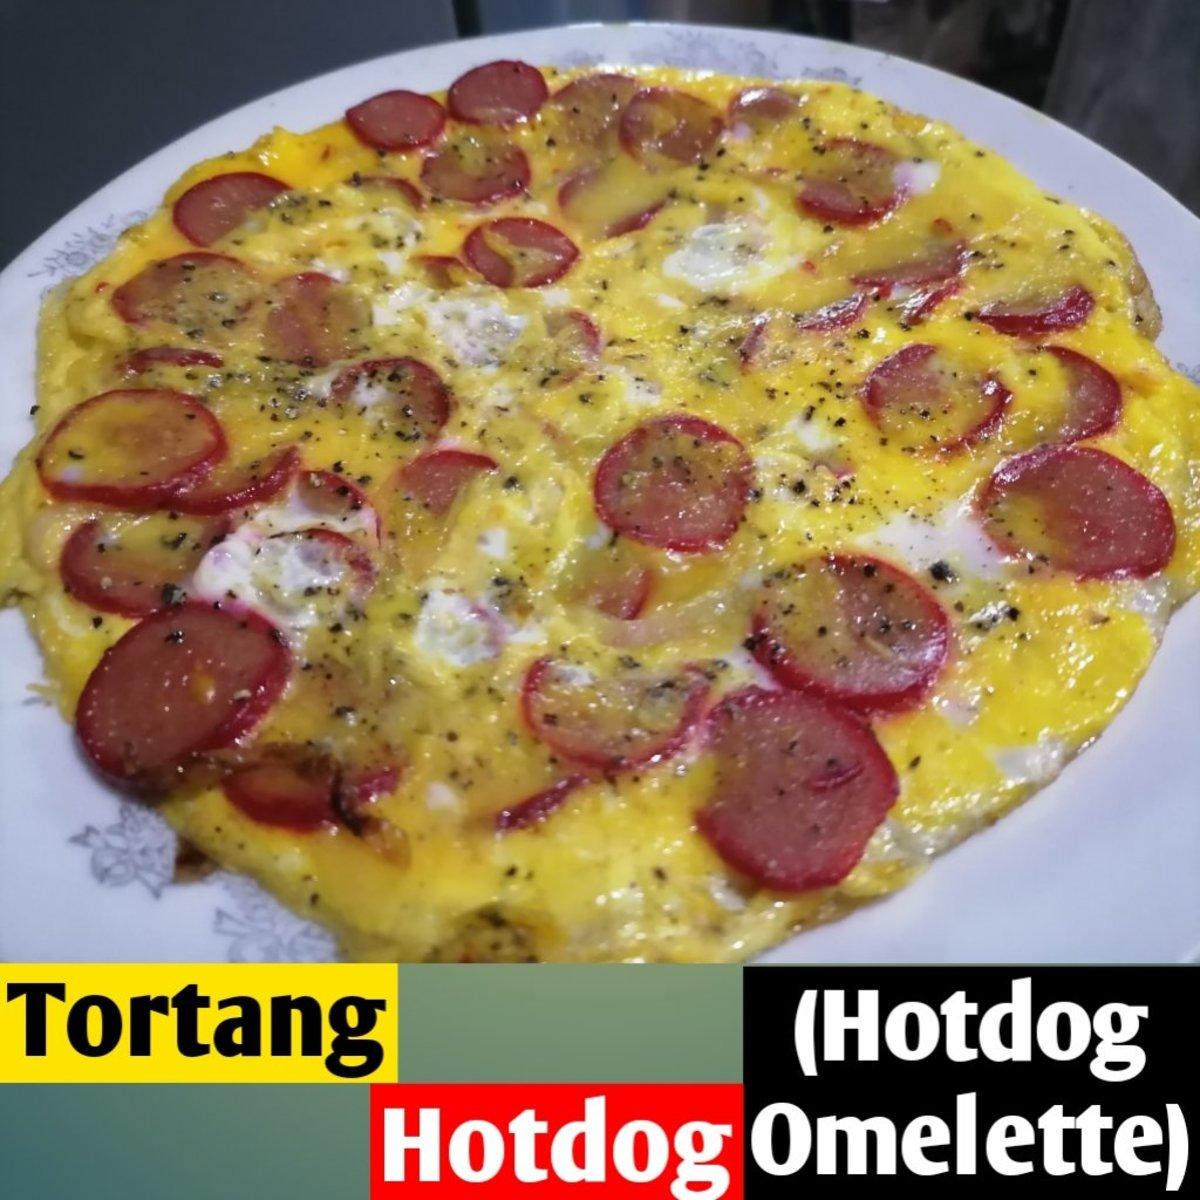 Tortang Hotdog (Hotdog Omelette)